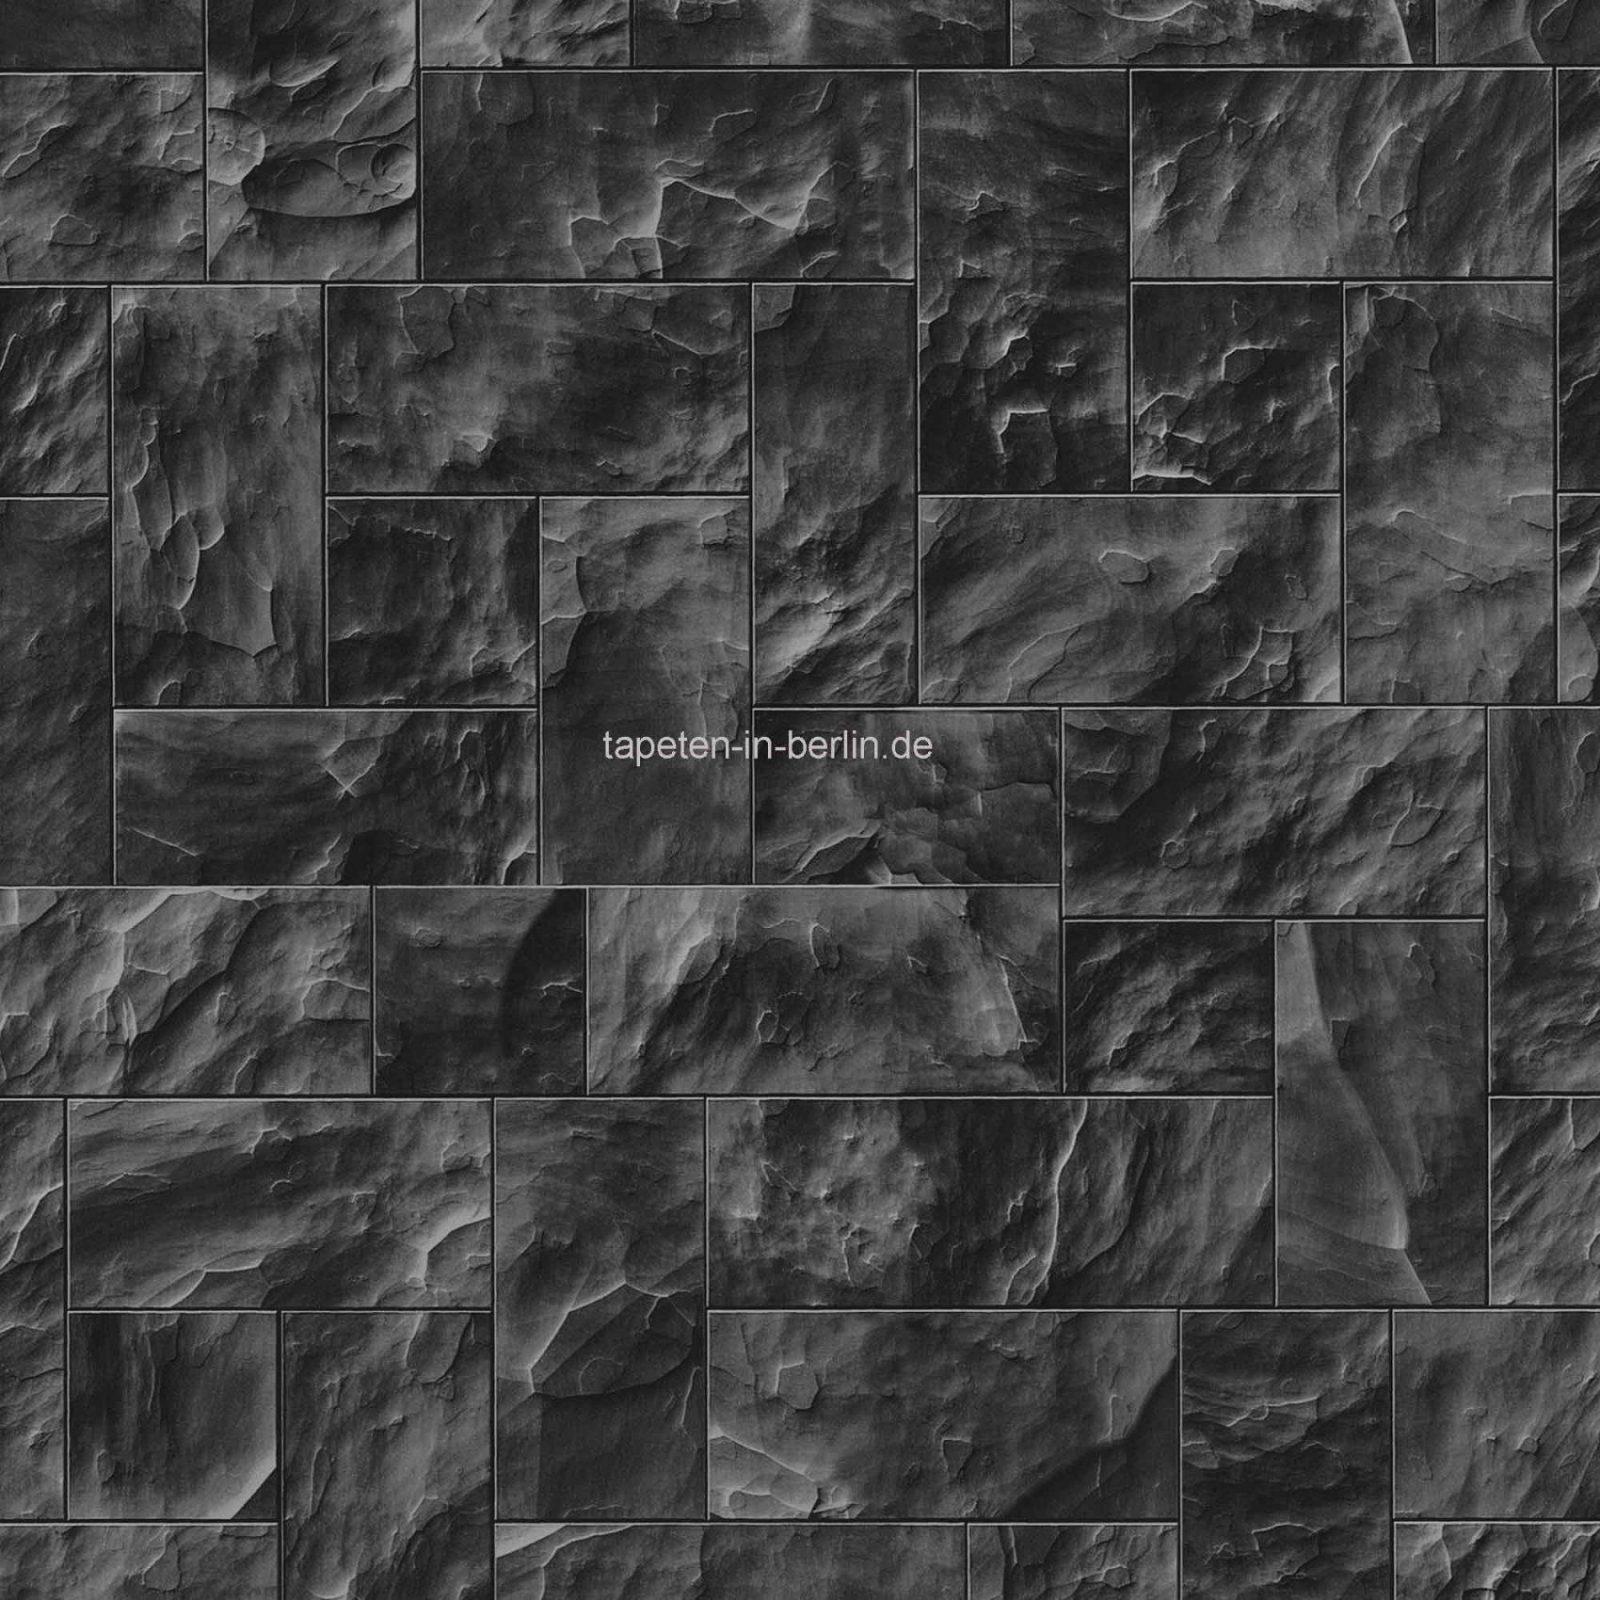 New Steintapeten In 3D Optik Grau Beige Braun Wohnzimmer Steintapete von Steintapeten In 3D Optik Bild